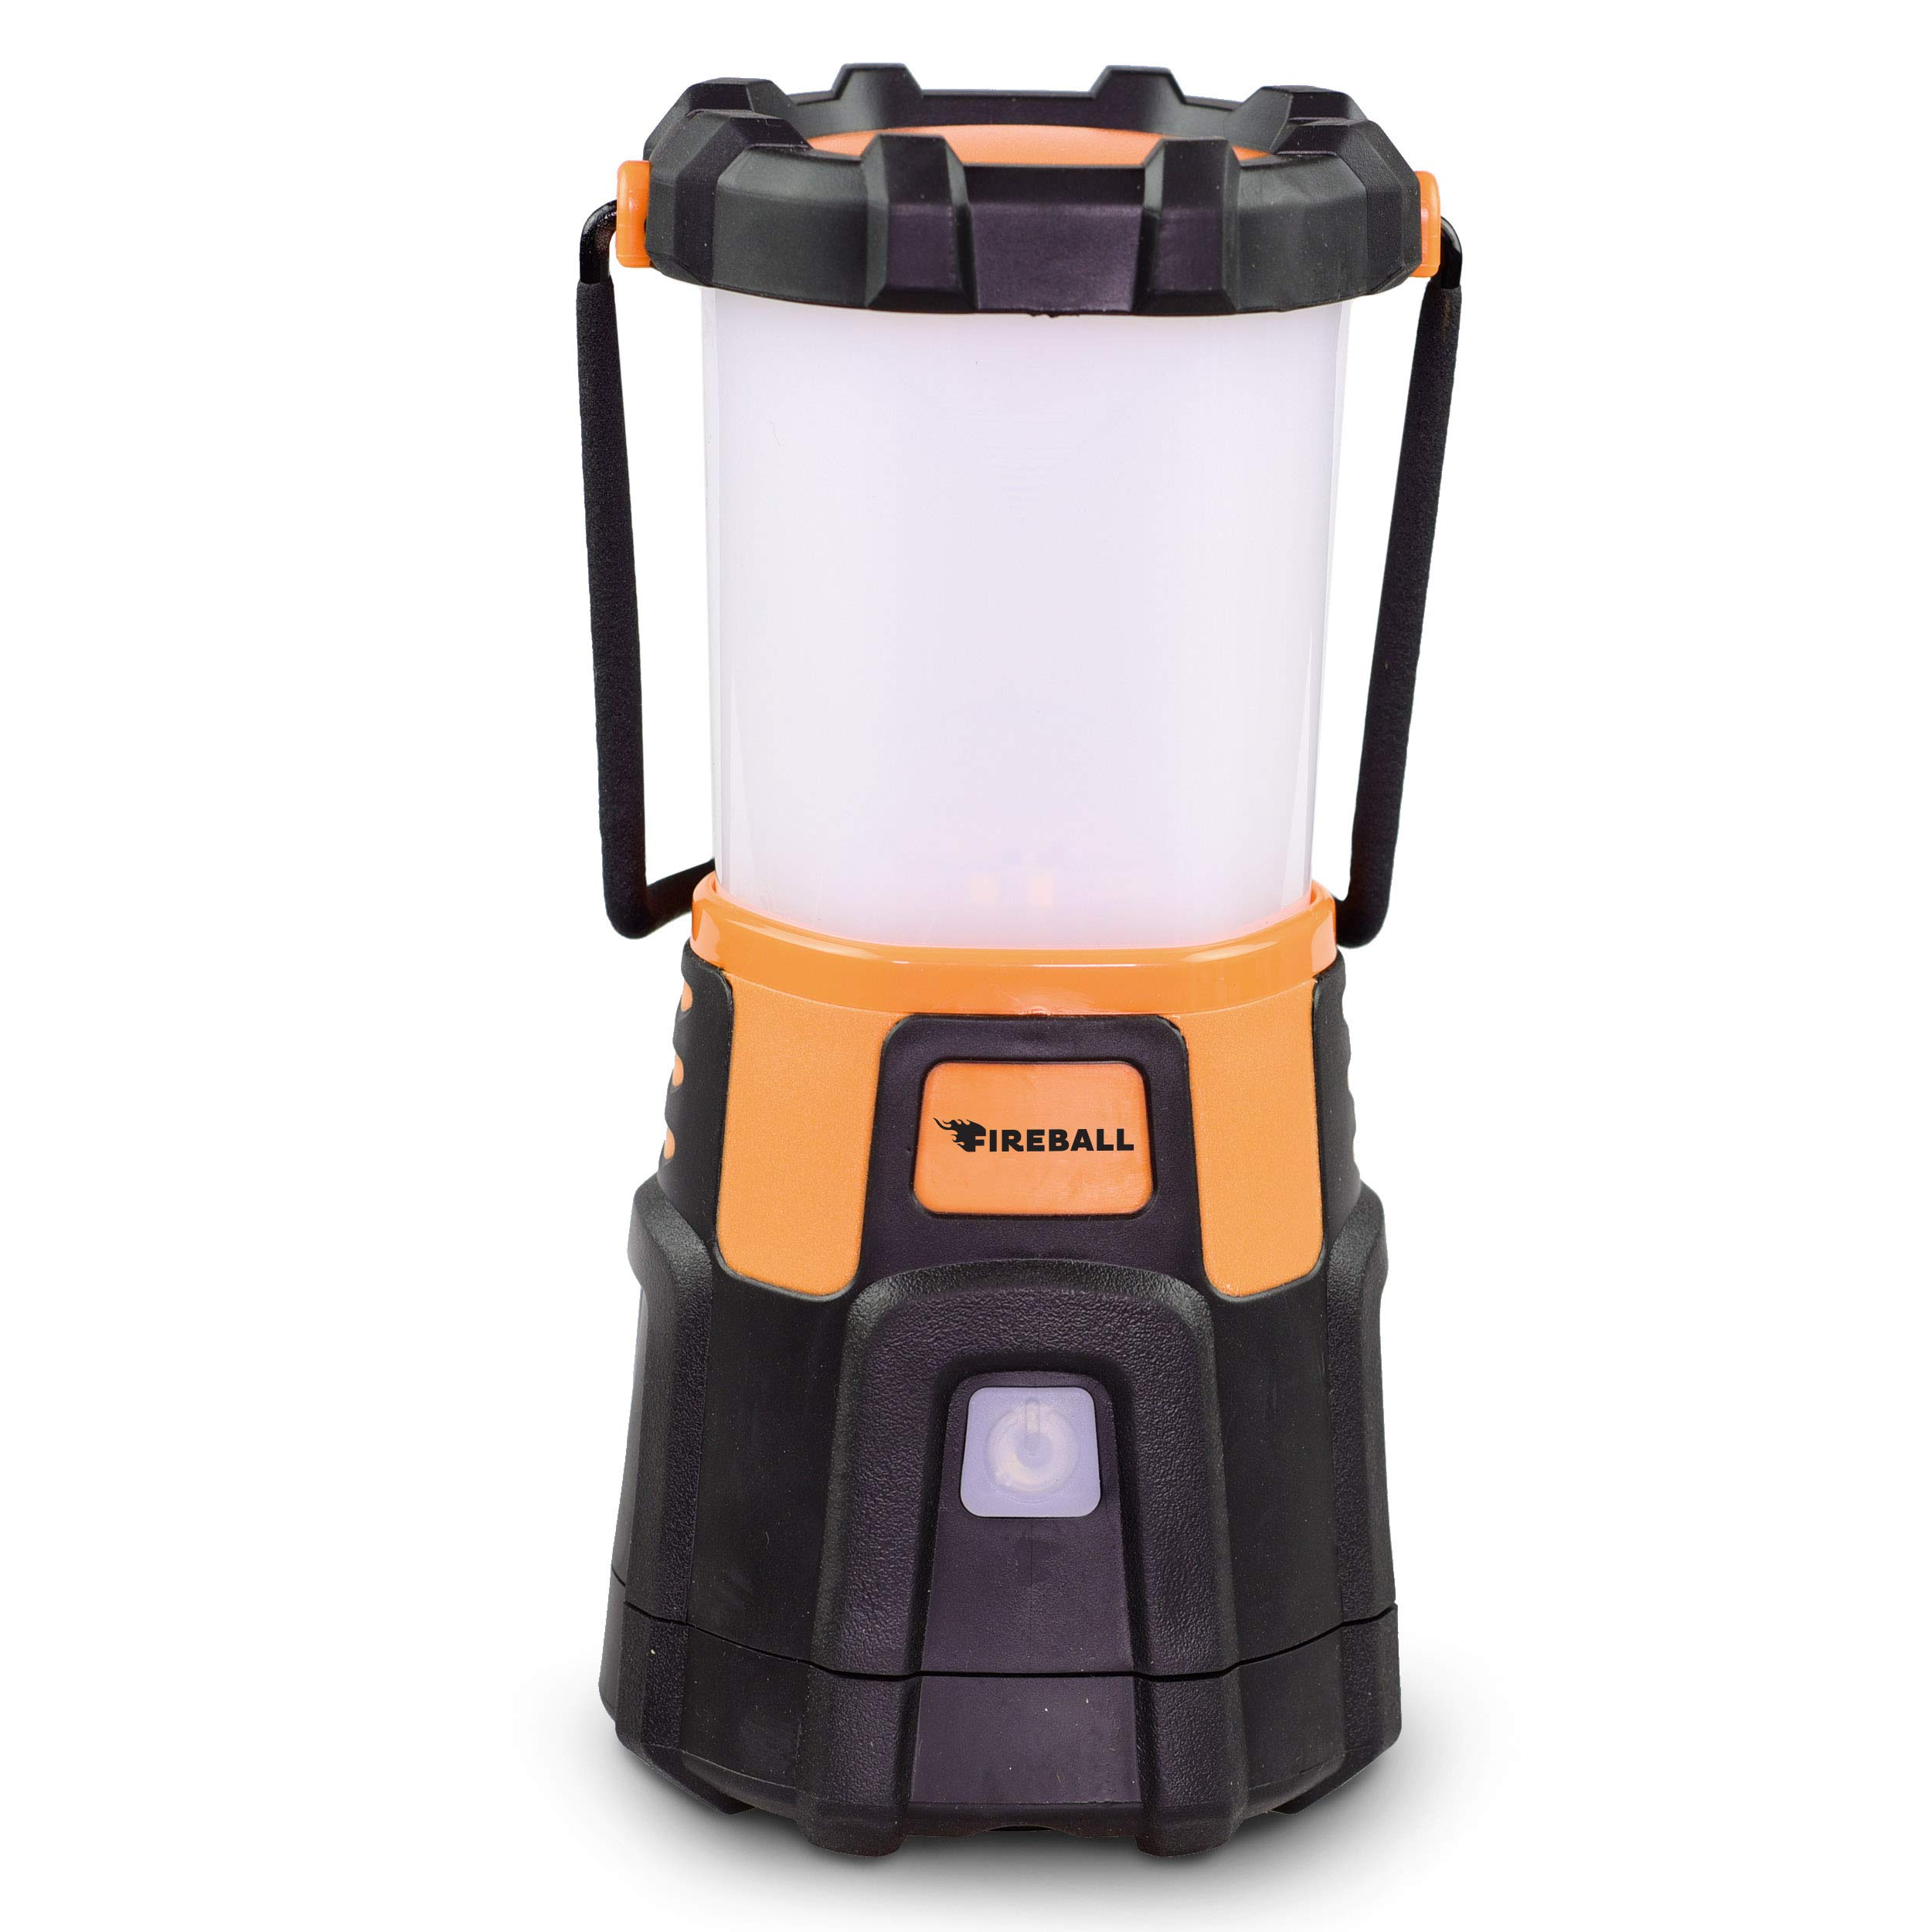 Blazin' Fireball | Brightest Lanterns Battery Powered | LED Hurricane Lantern | Emergency, Storm, Camping Torch | Battery Operated Lights | 1000 Lumen Lantern by Blazin